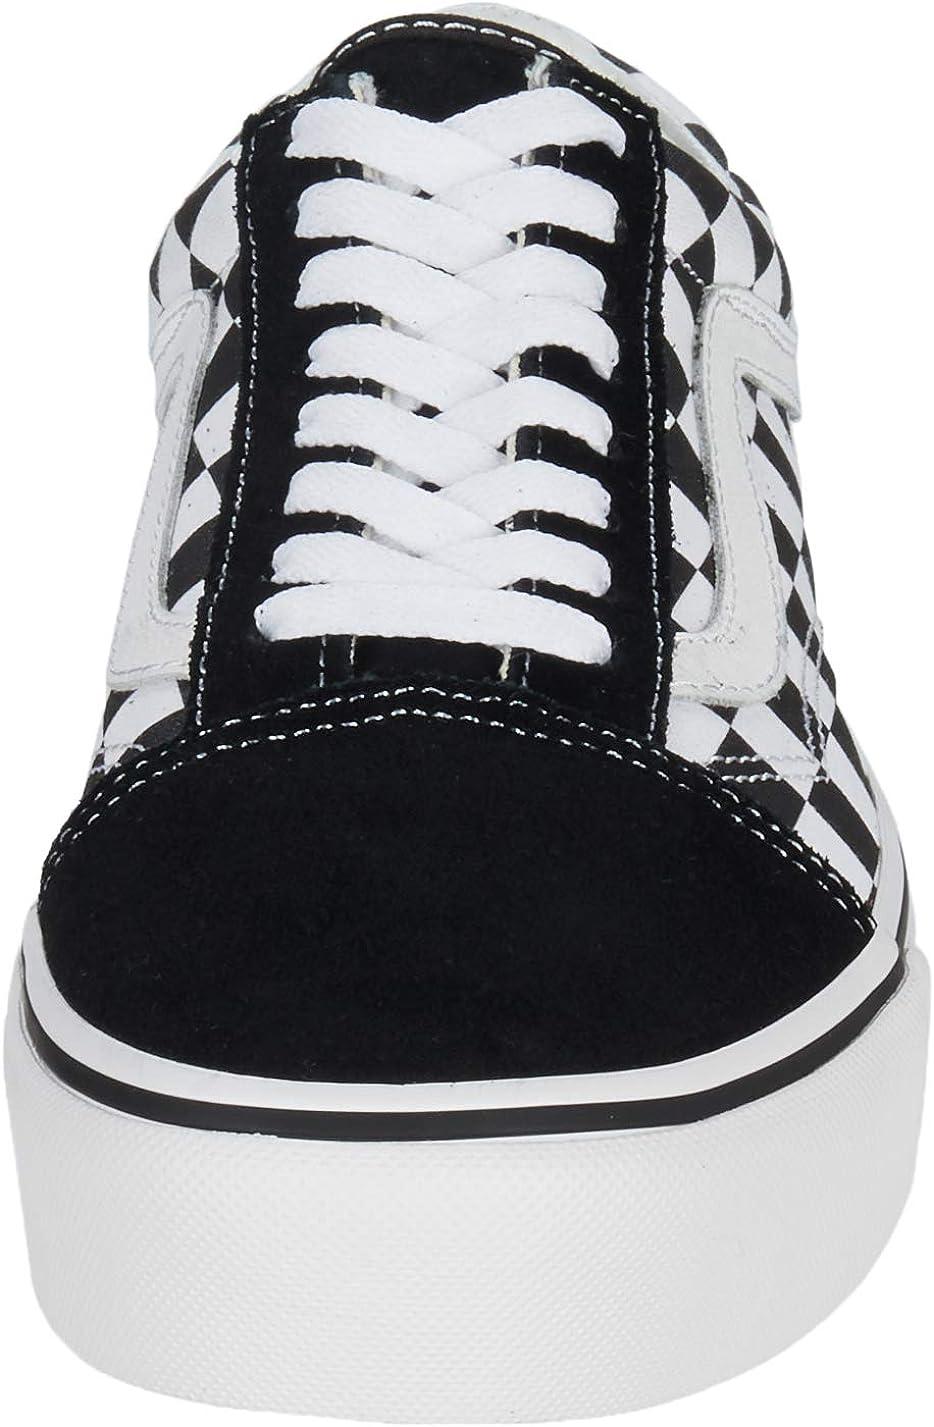 Vans Old Skool Trainers Black Lilac Rose ($90) ❤ liked on